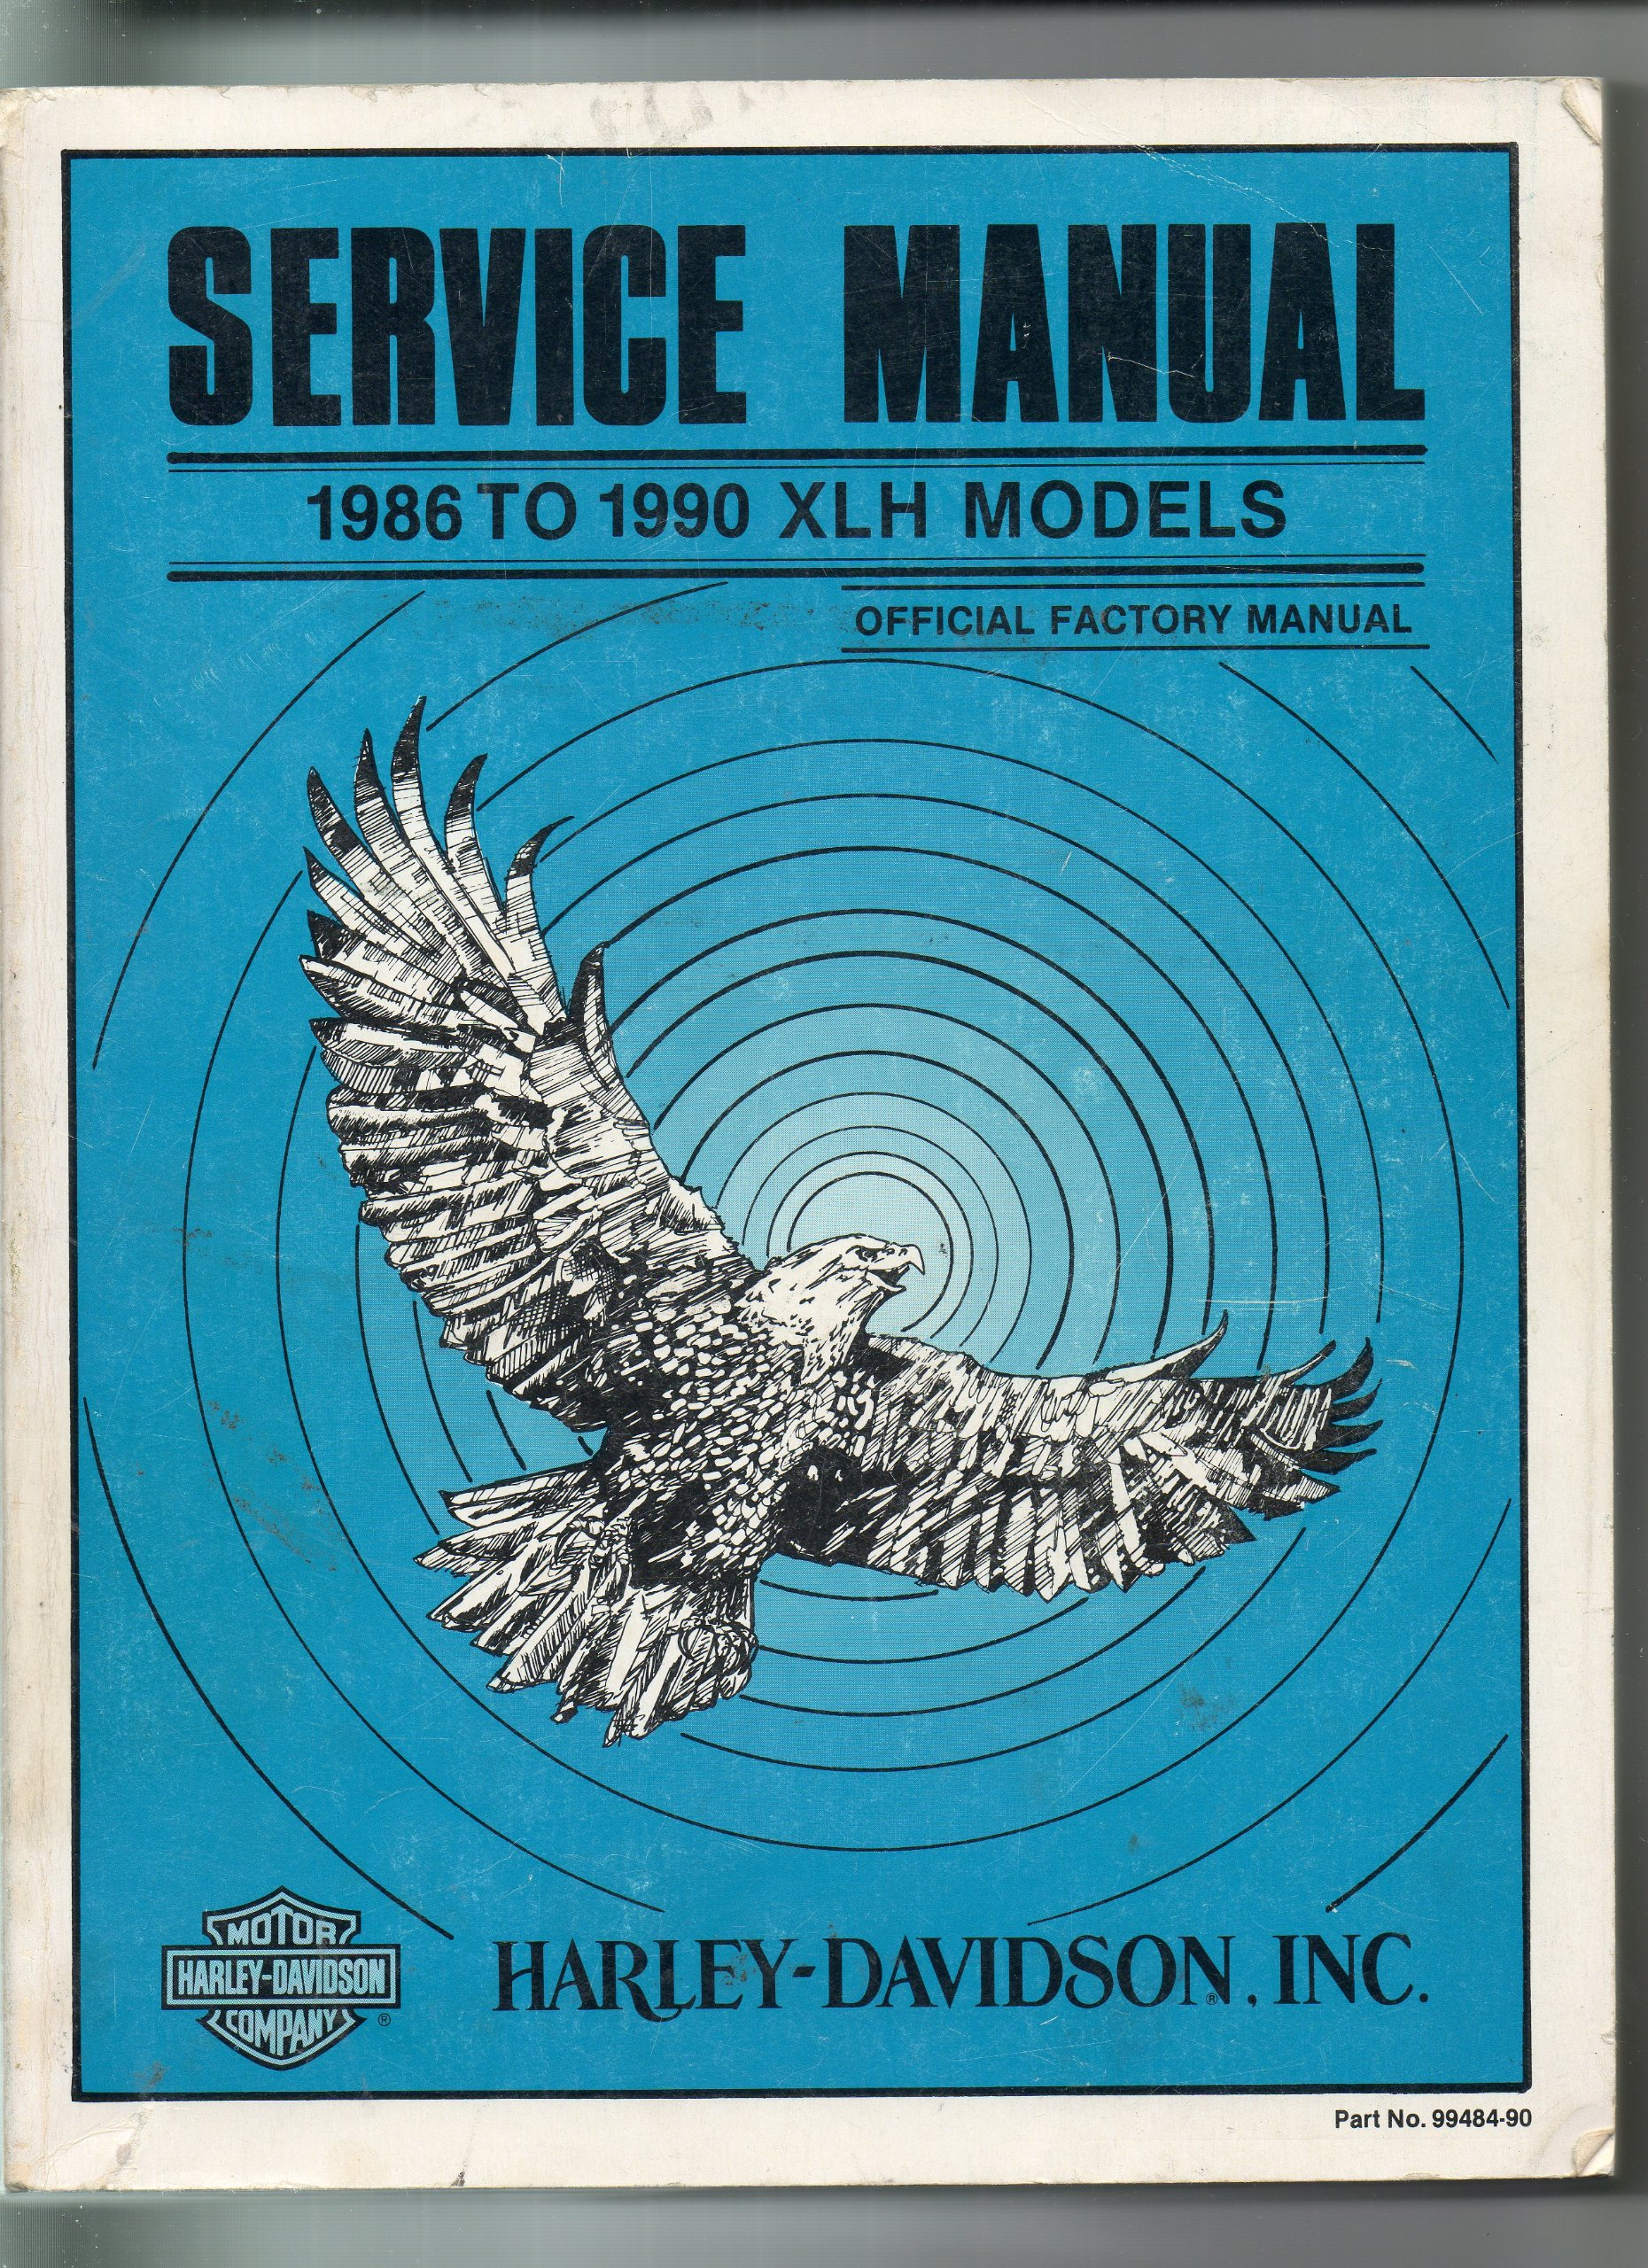 Harley-Davidson Service Manual 1986 to 1990 XLH Models: Harley-Davidson  Motor Company: Amazon.com: Books